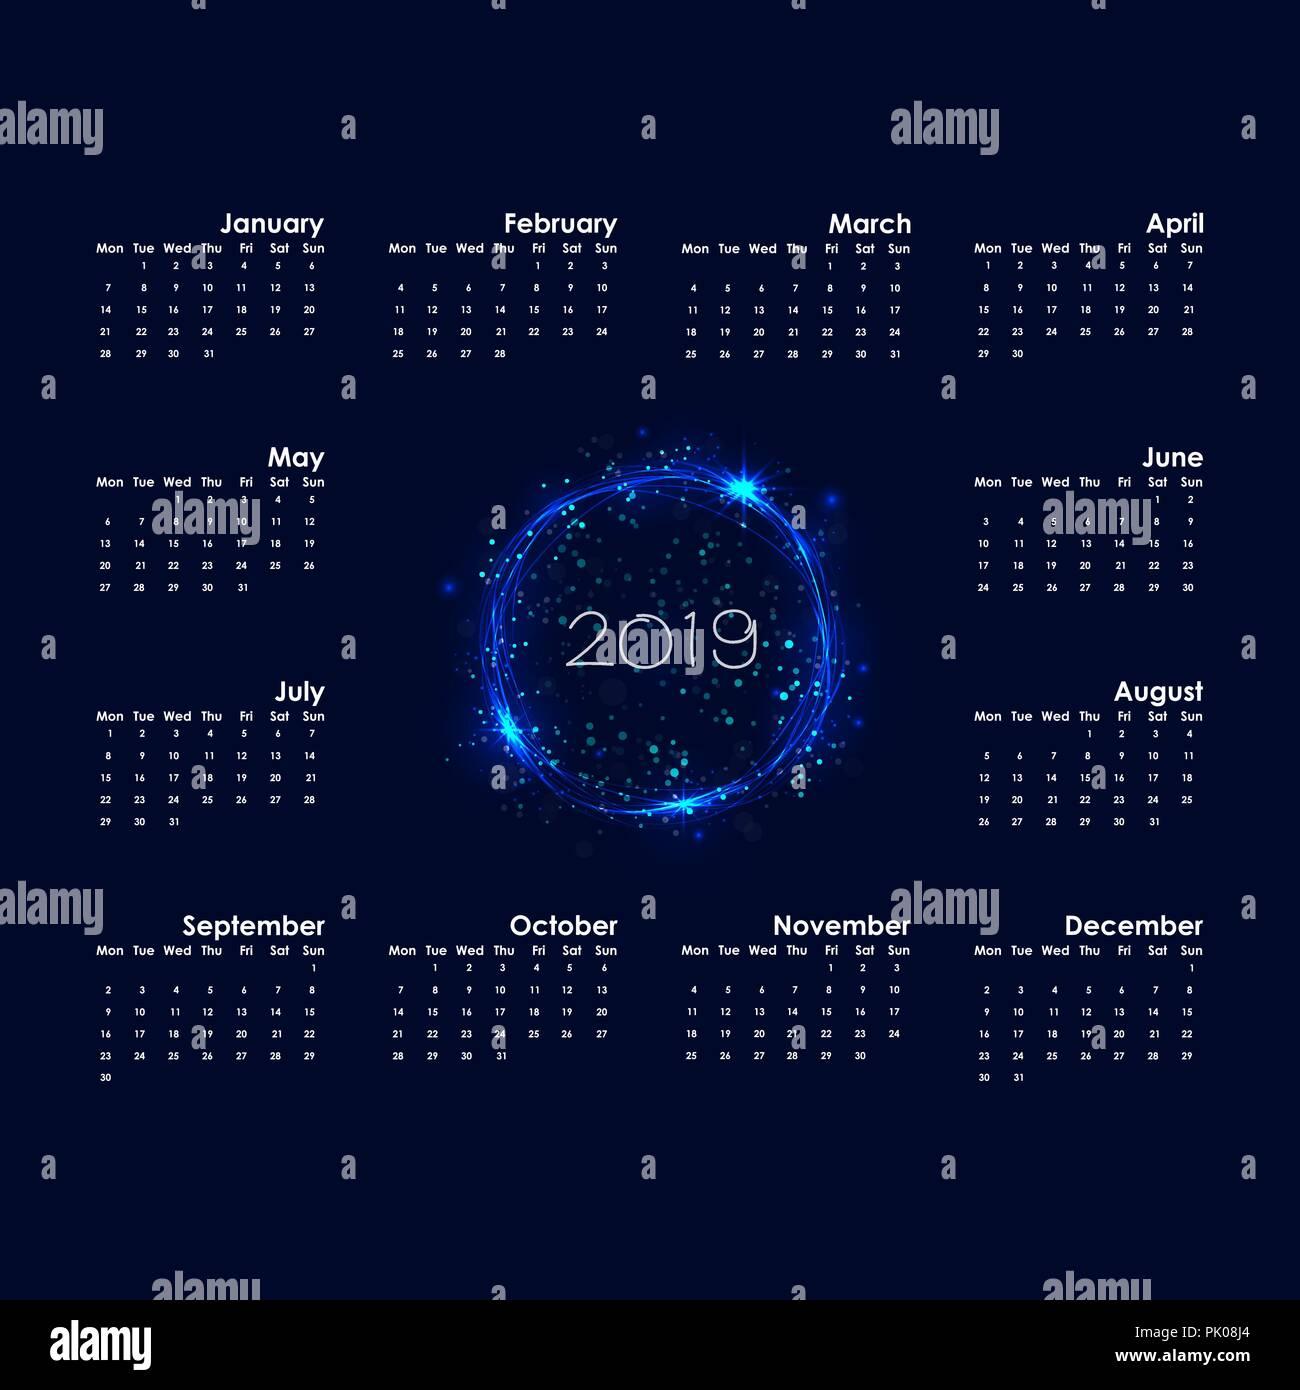 2019 calendar templatestarts mondayyearly calendar vector design stationery templatehappy new year 2019 backgroundabstract burning circles with gl